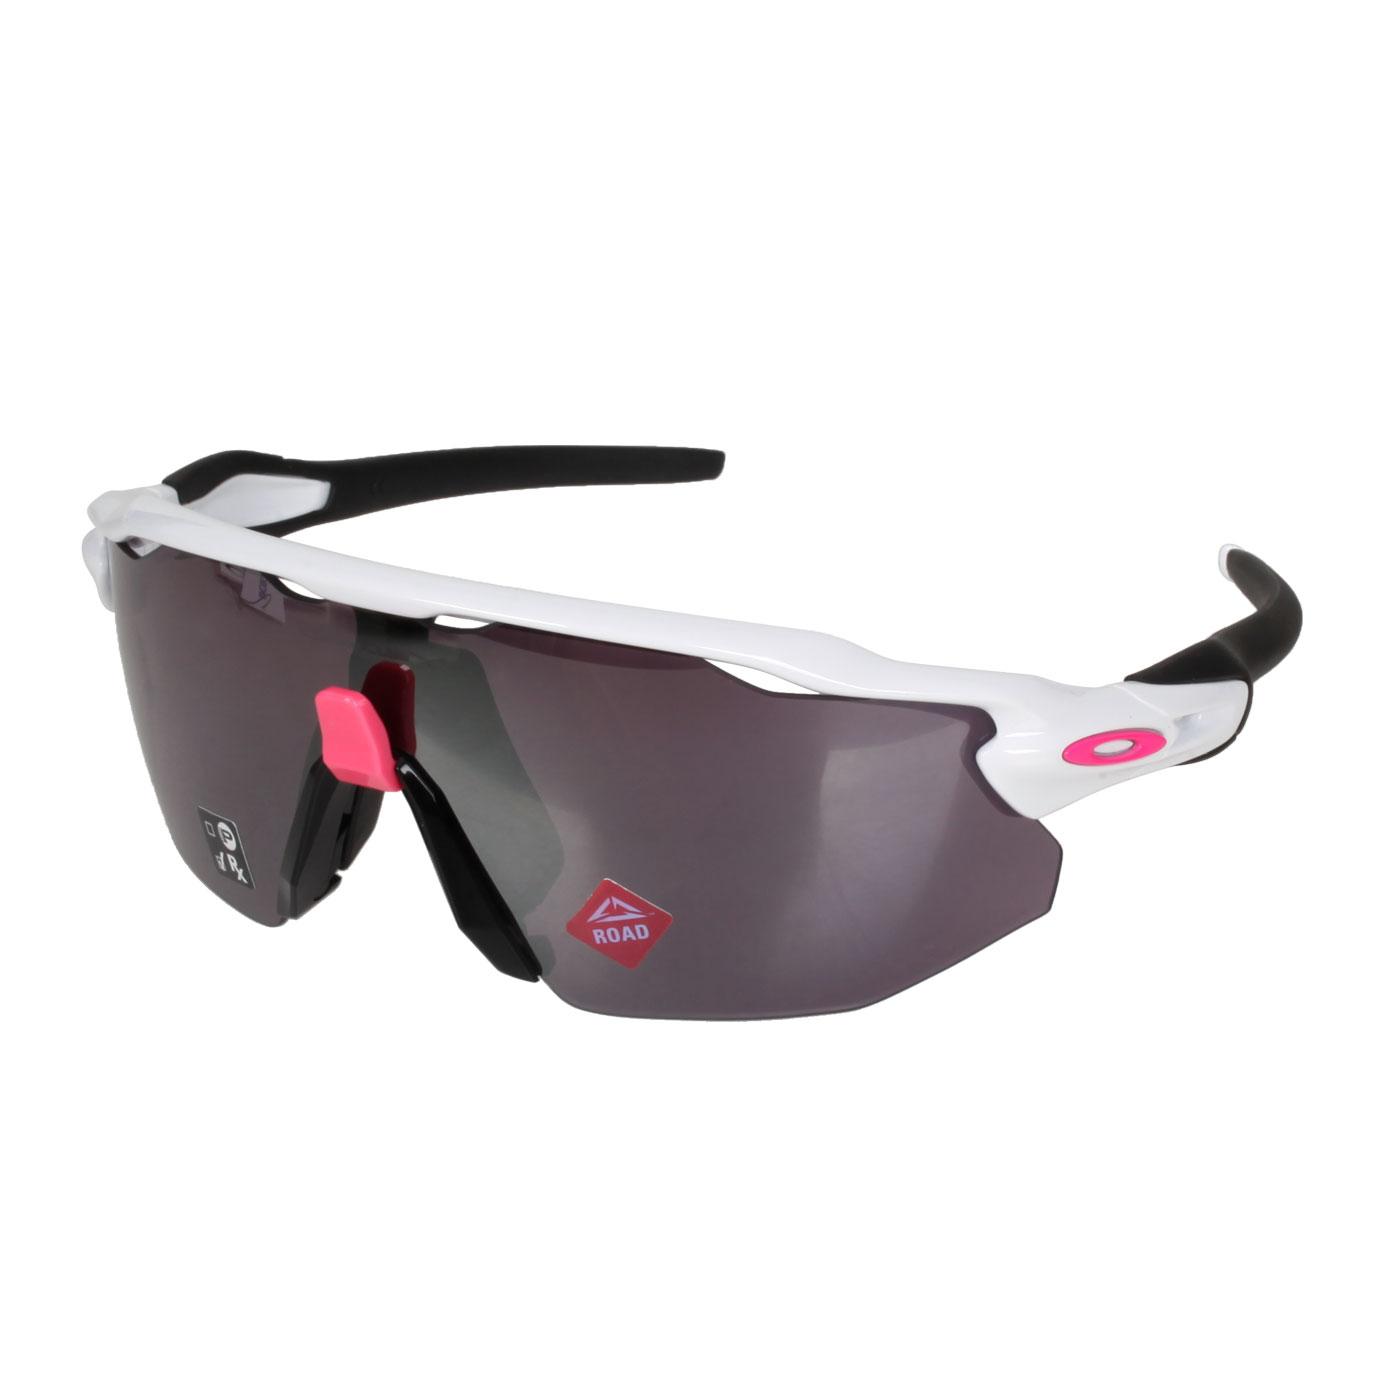 OAKLEY RADAR EV ADVANCER 一般太陽眼鏡 (附硬盒鼻墊) OAK-OO9442-0438 - 白桃紅紫